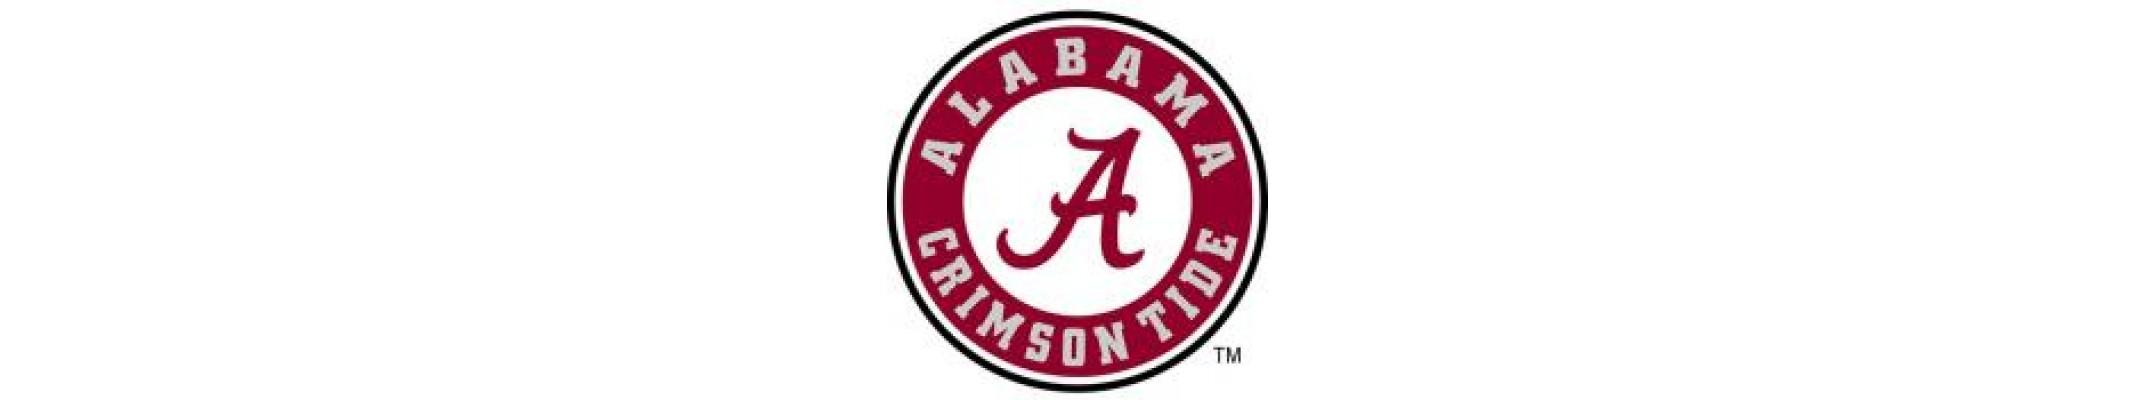 Alabama University of Boards